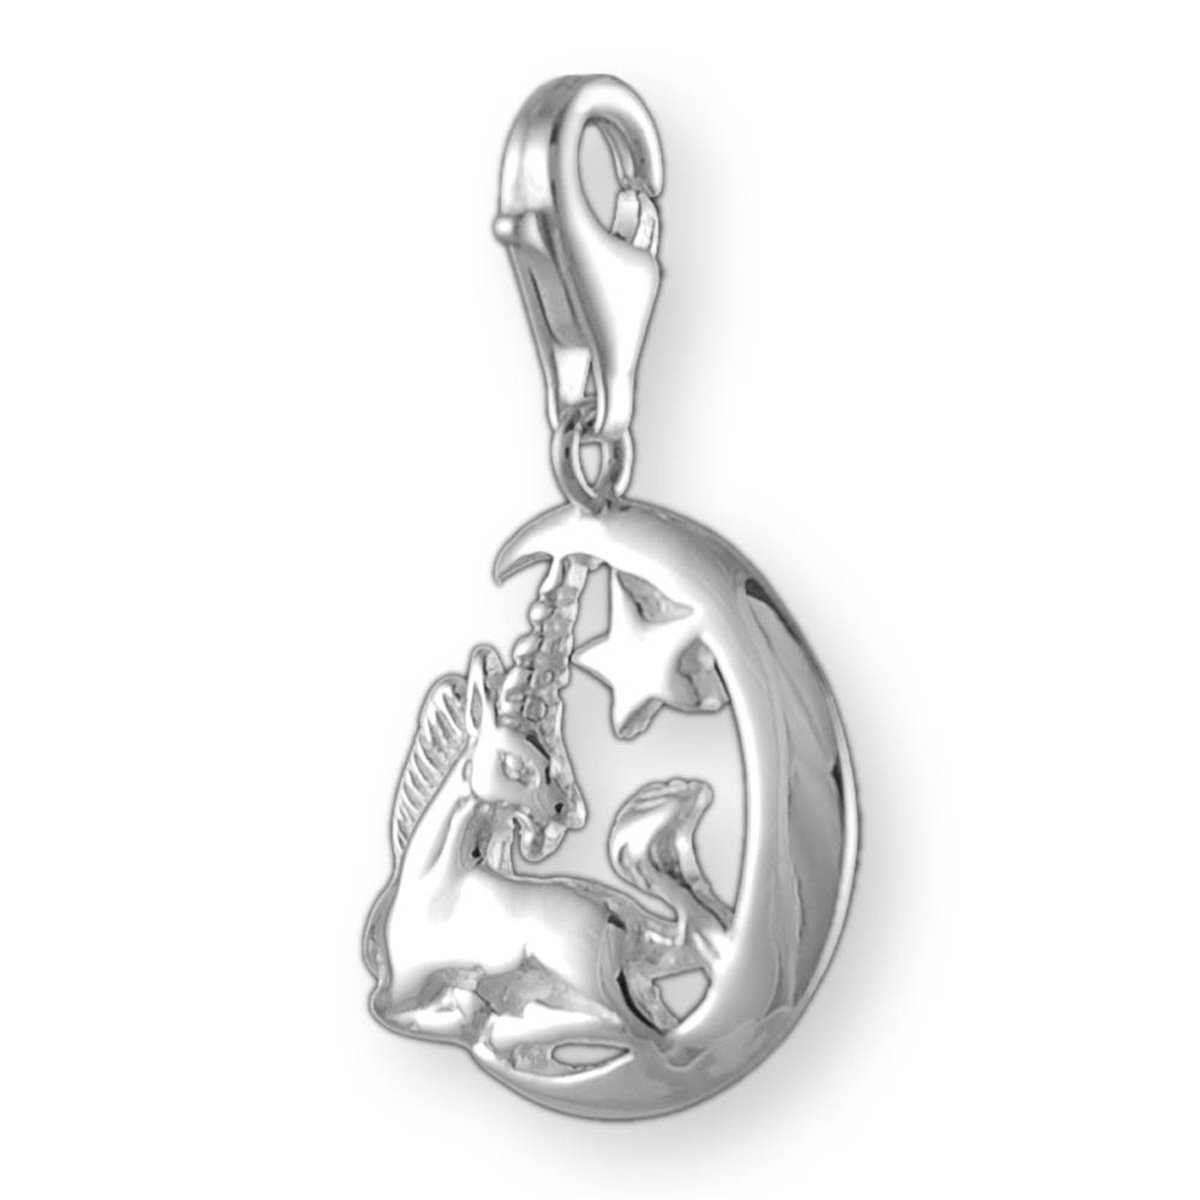 Melina Damen-Charm Anhänger Einhorn 925 Sterling Silber 1800880  Amazon.de   Schmuck 8347f51457